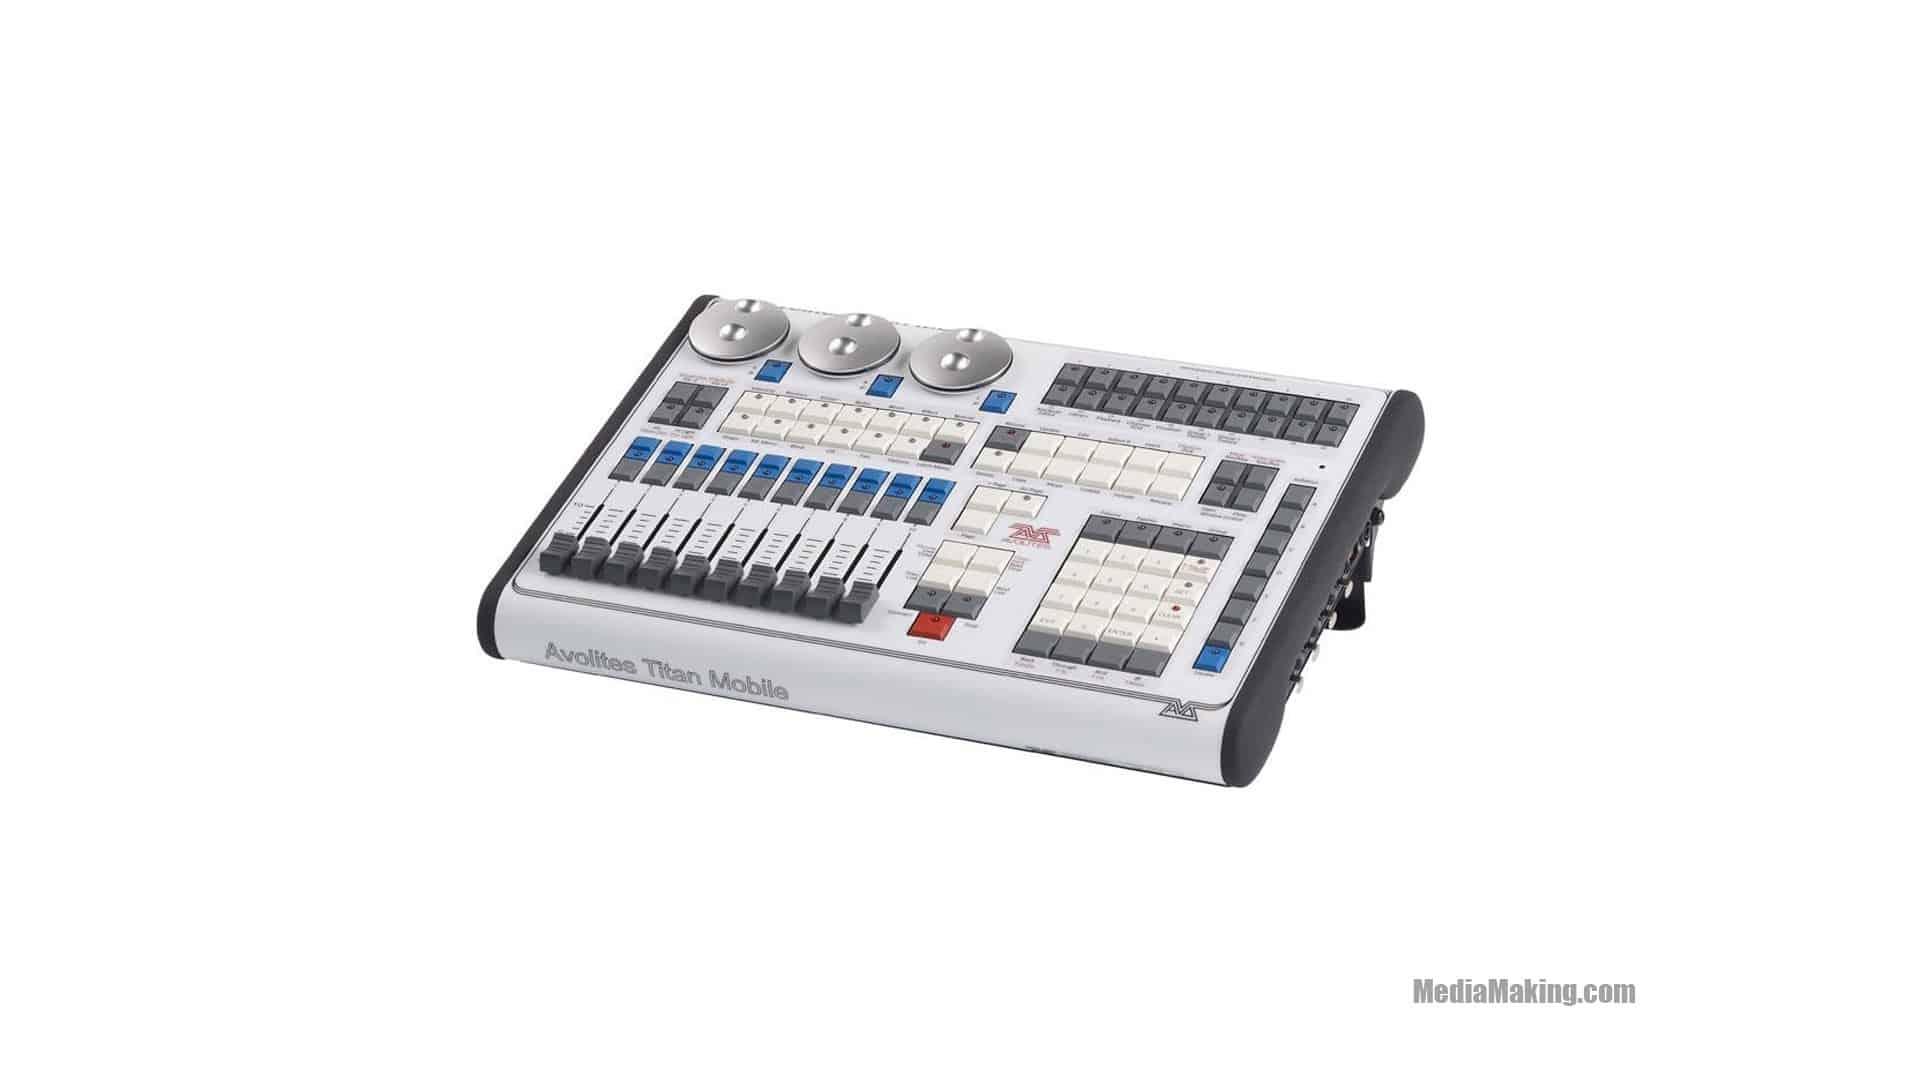 , Stage light mixer, MediaMaking